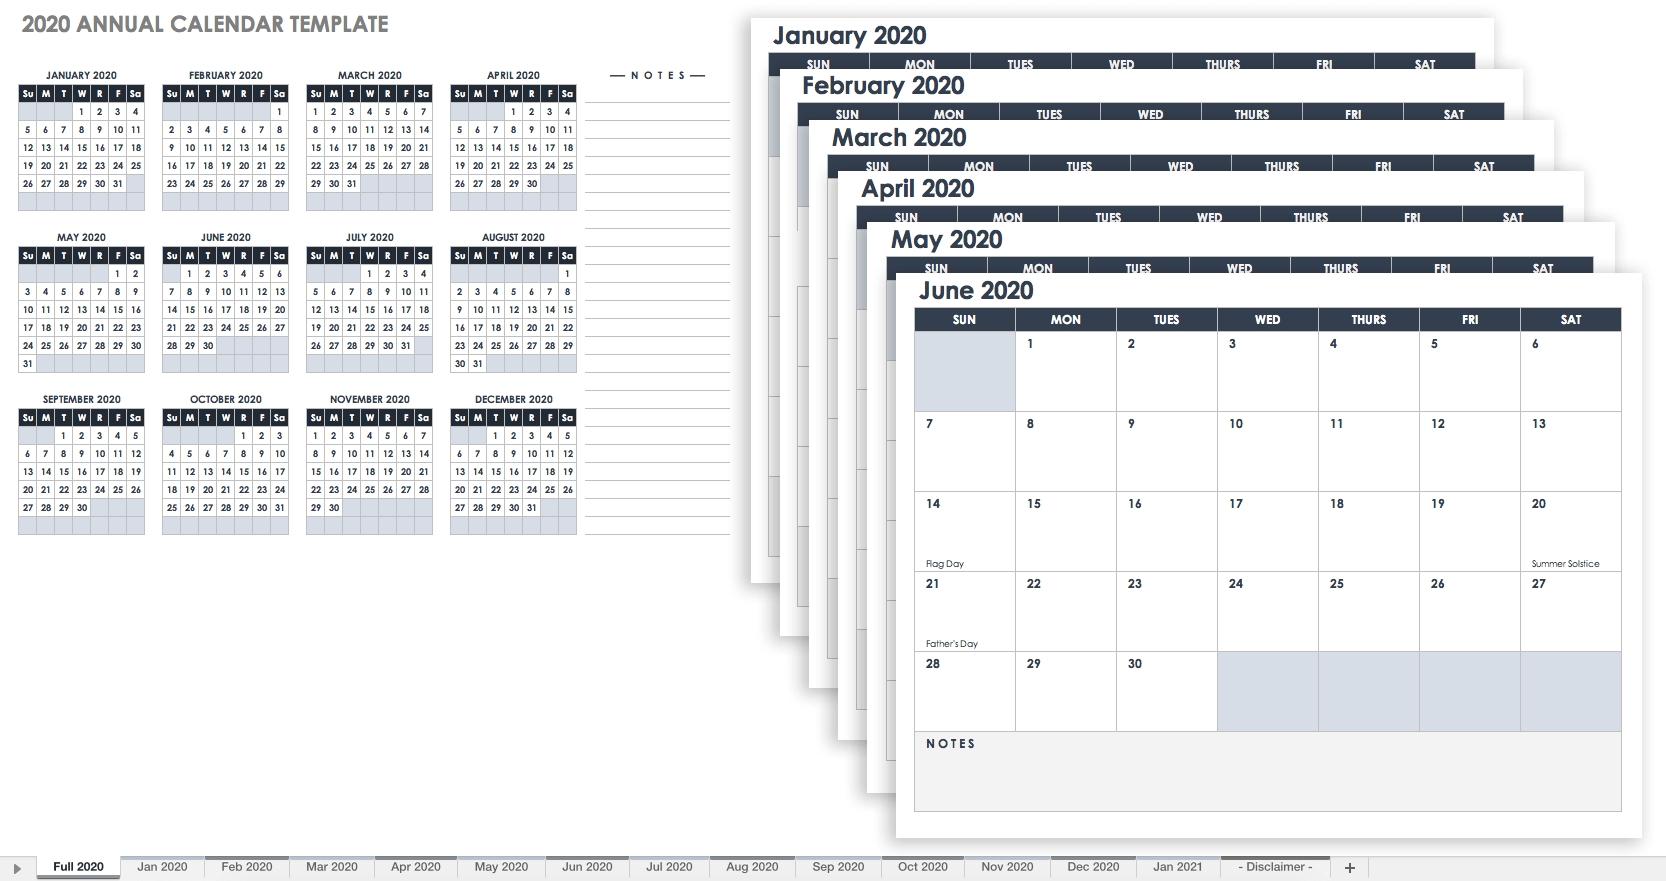 Free Blank Calendar Templates - Smartsheet-Monday Thru Friday Calendar Template 2020